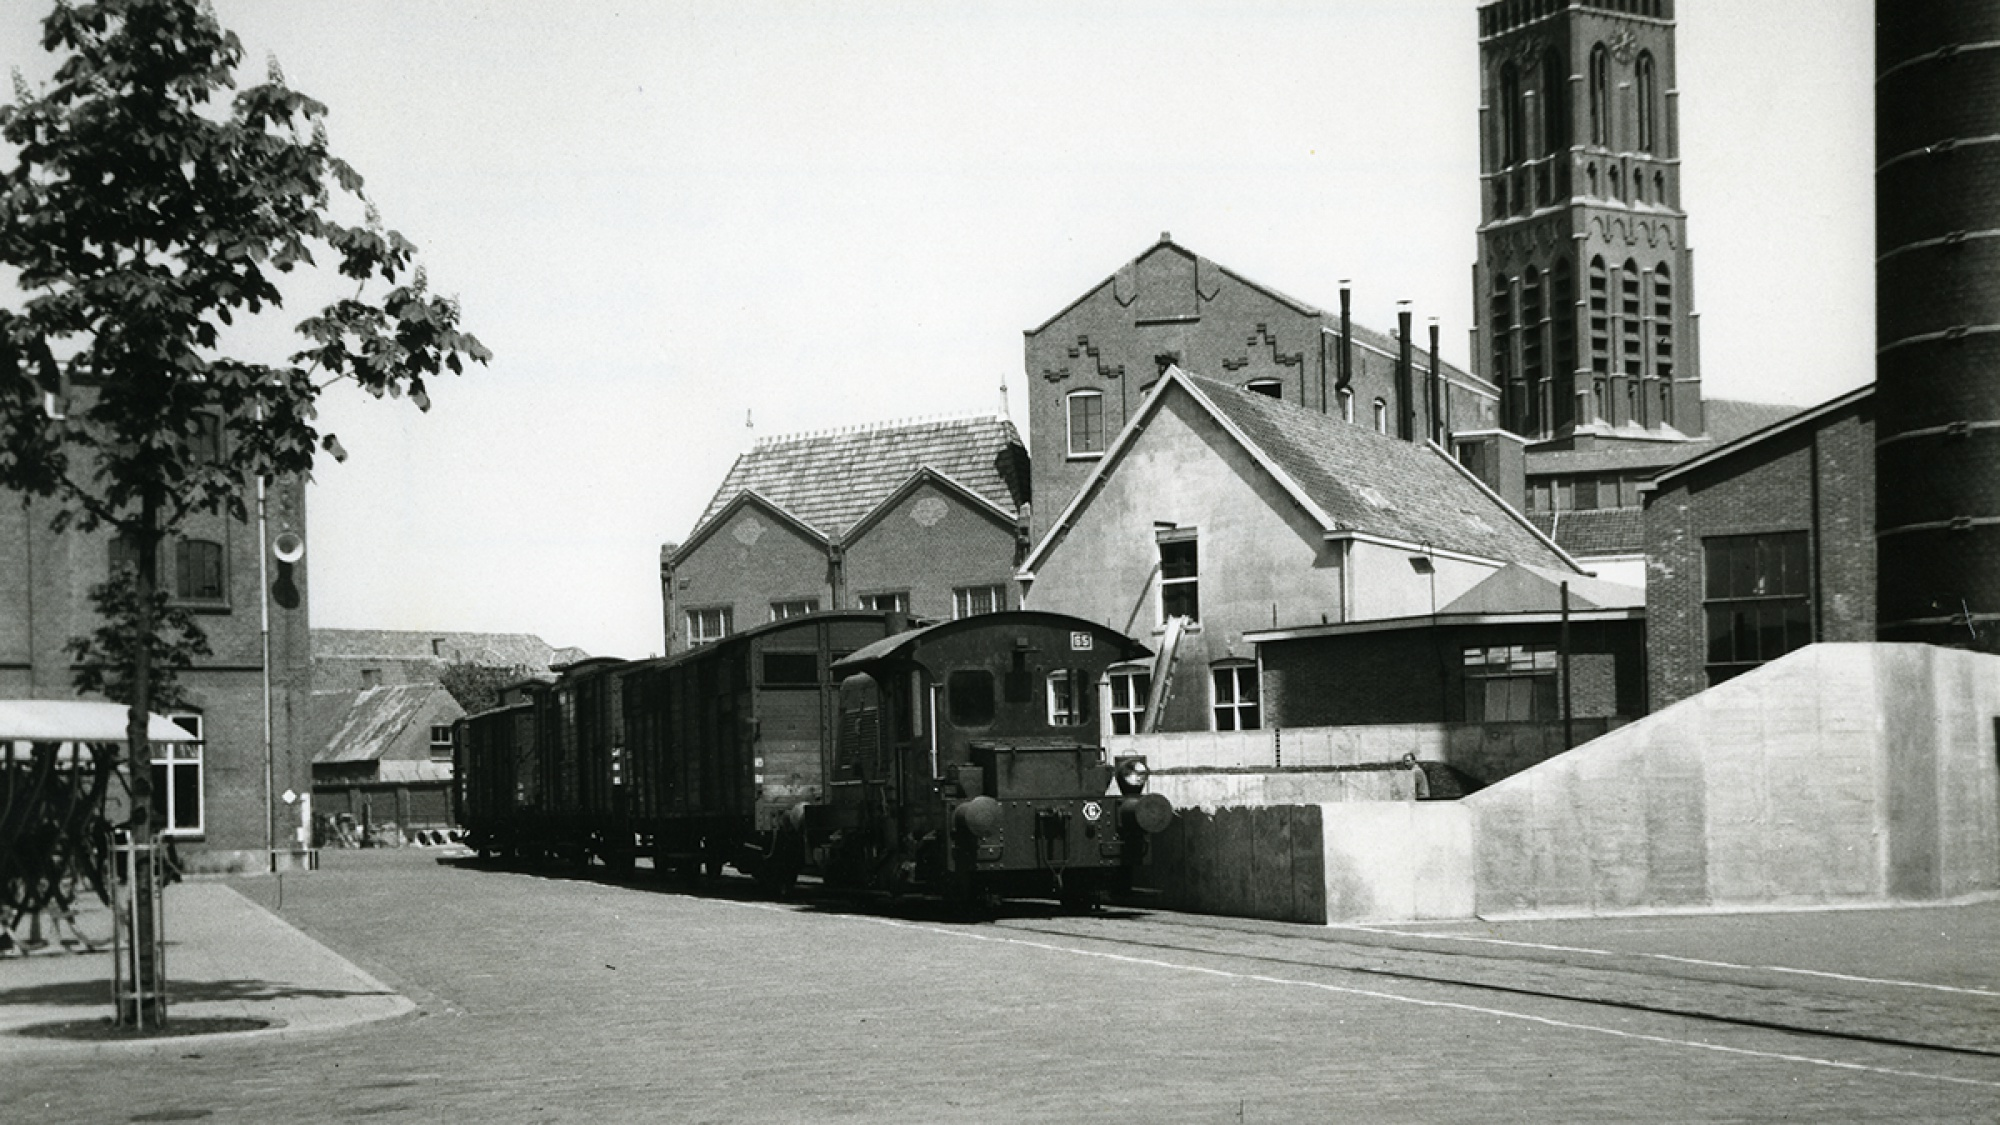 Fabrieksterrein binnenplaats, naast Grote Kerk, Oss